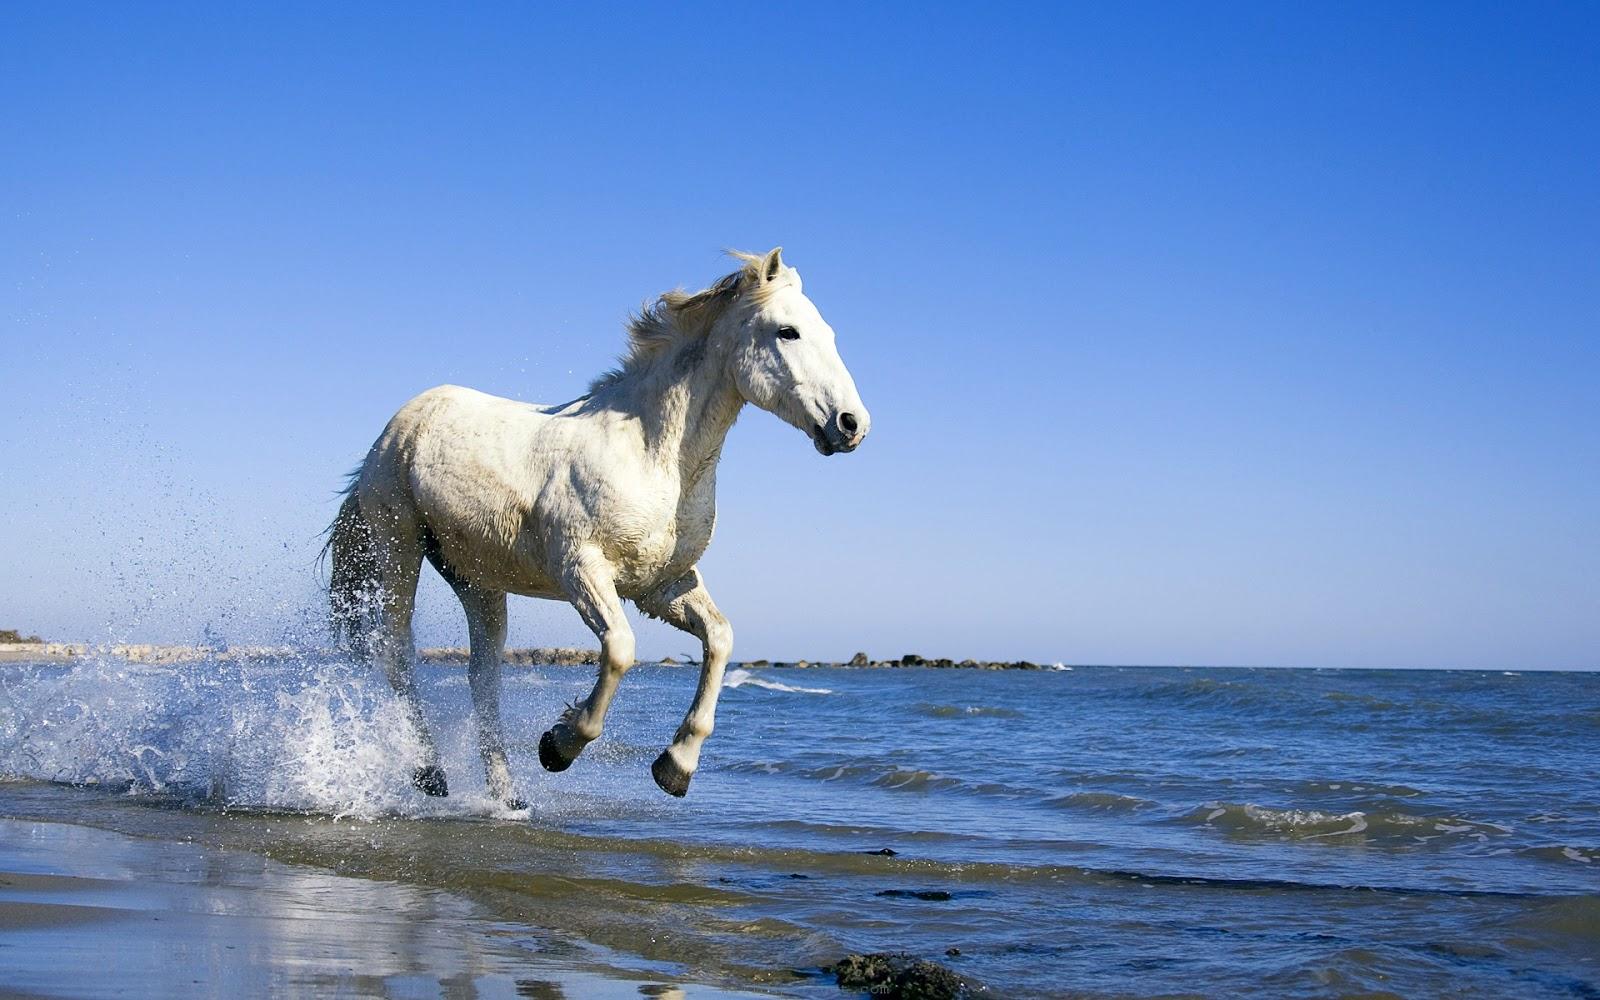 Great   Wallpaper Horse Creative - camargue+white+horse+hd+wallpaper  Photograph_672210.jpg